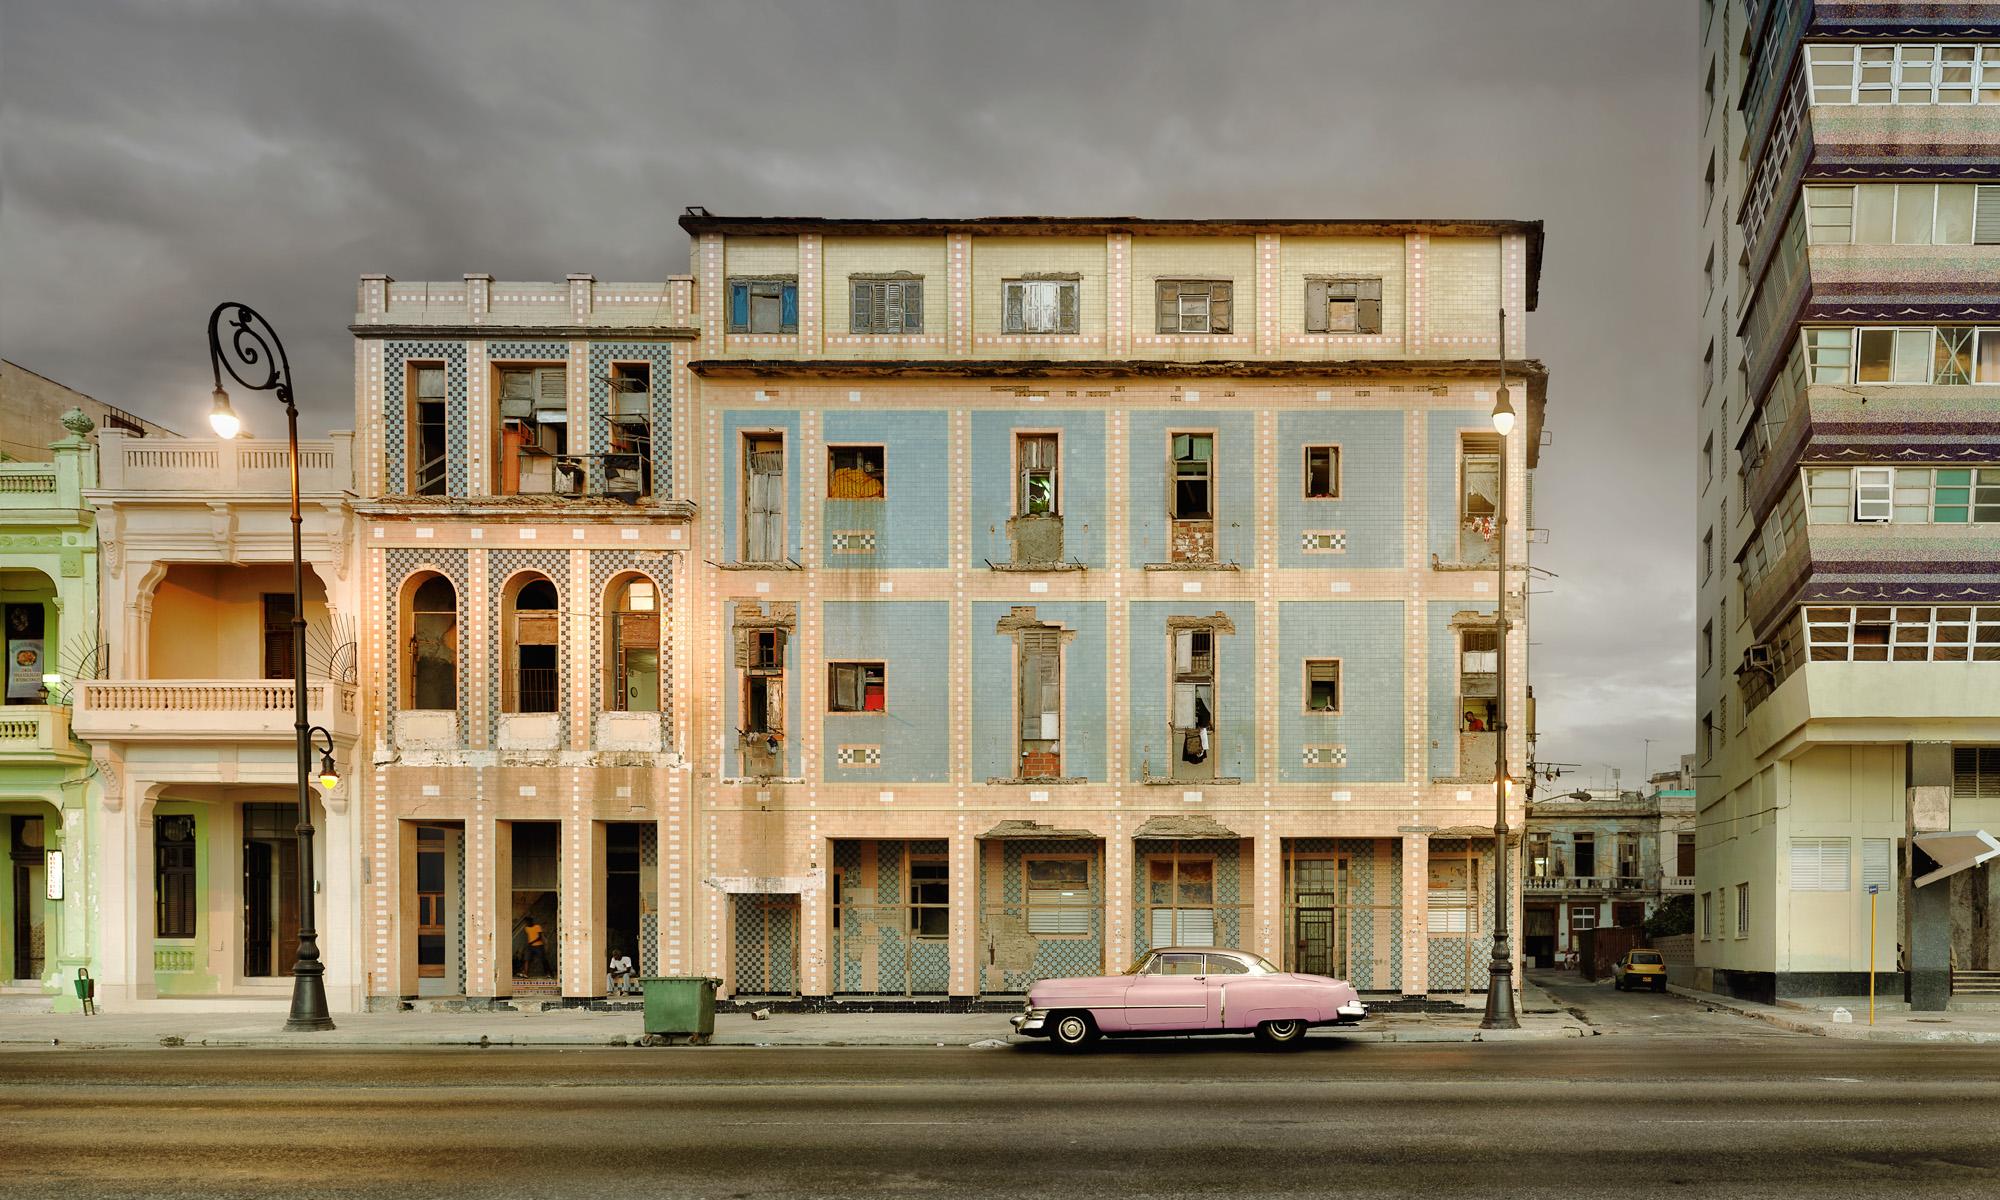 Malecon - Pink Cadillac - Havana, Cuba 2012